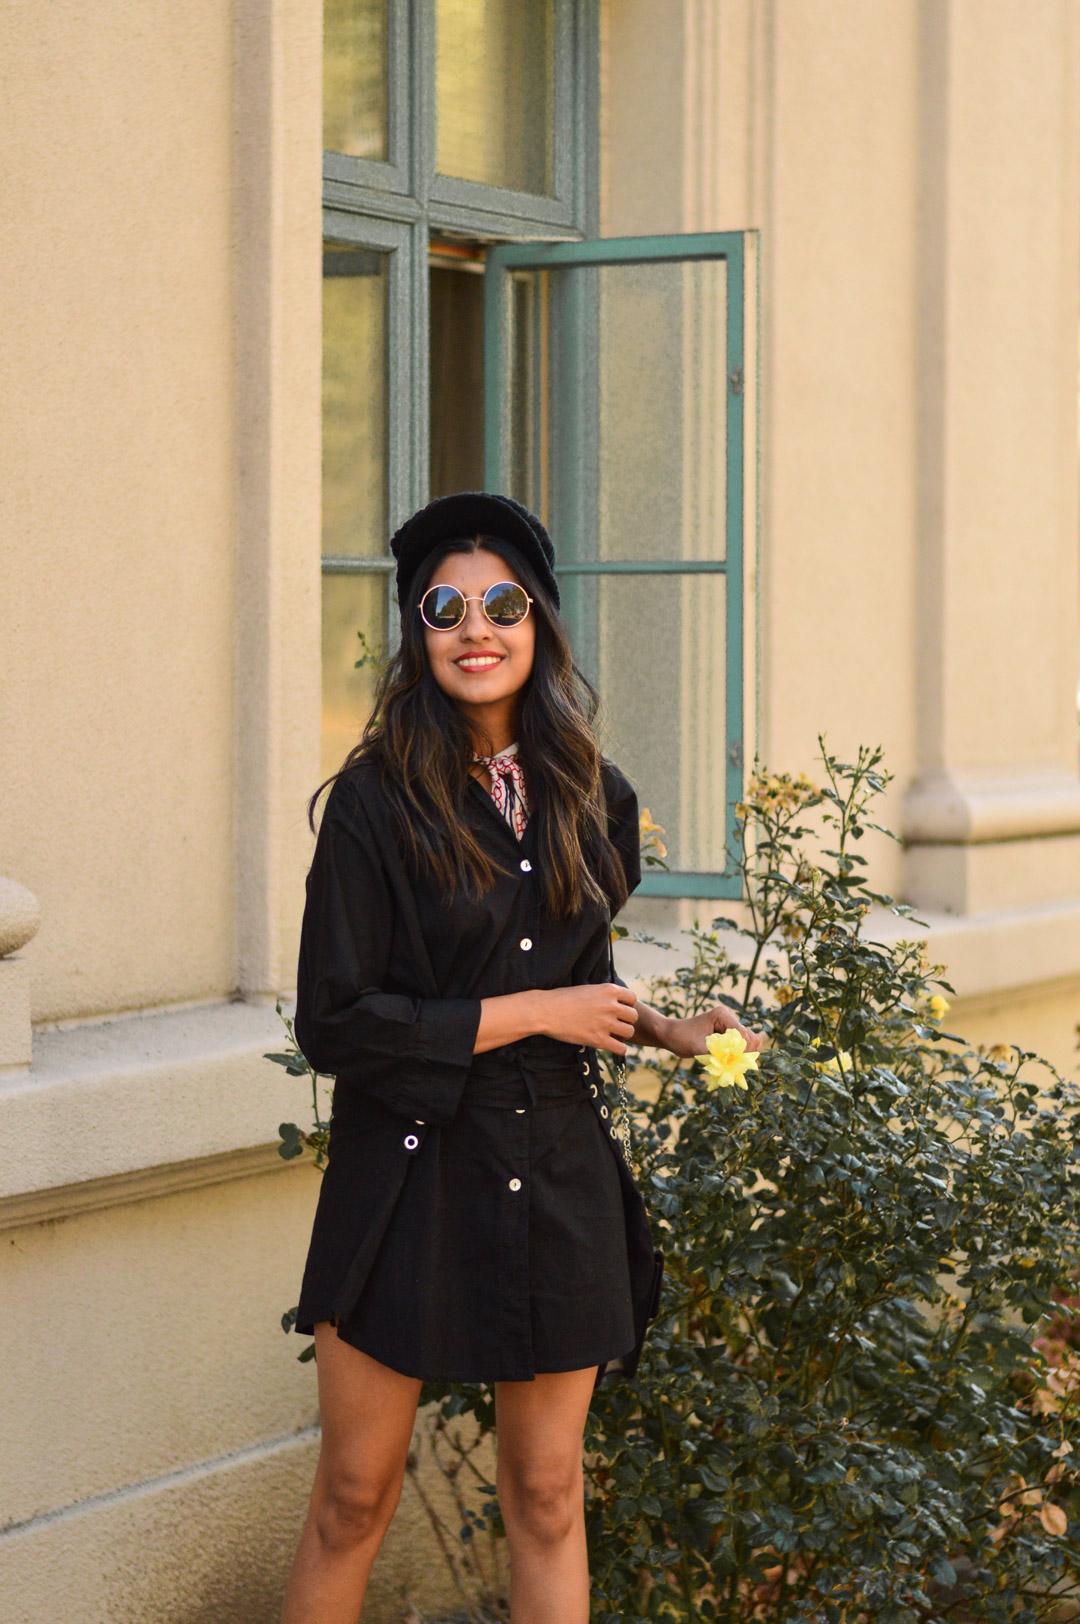 corset-shirtdress-silk-scarf-bakerboy-hat-fall-fashion 6